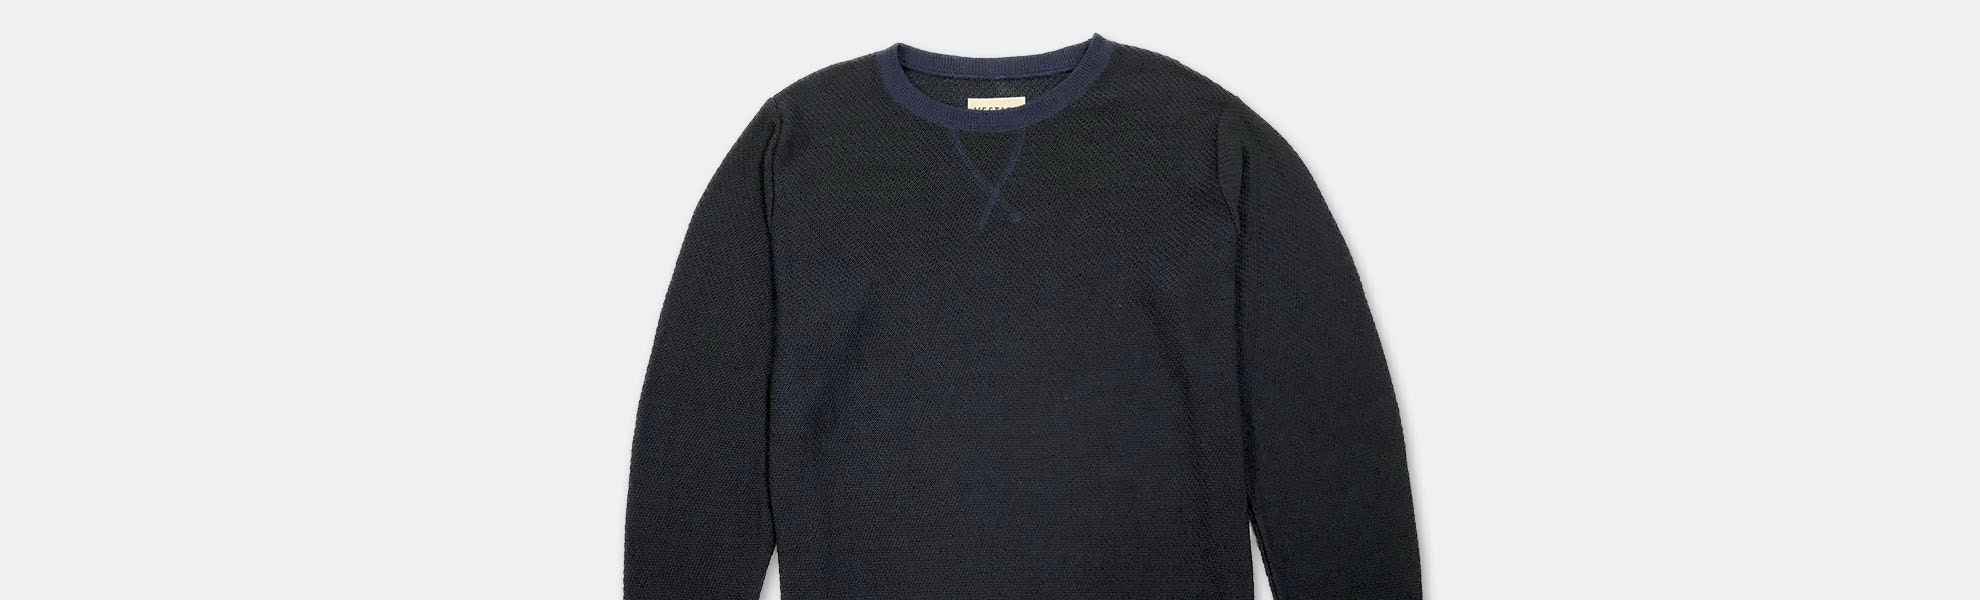 Vestige Crewneck Jumper Sweaters